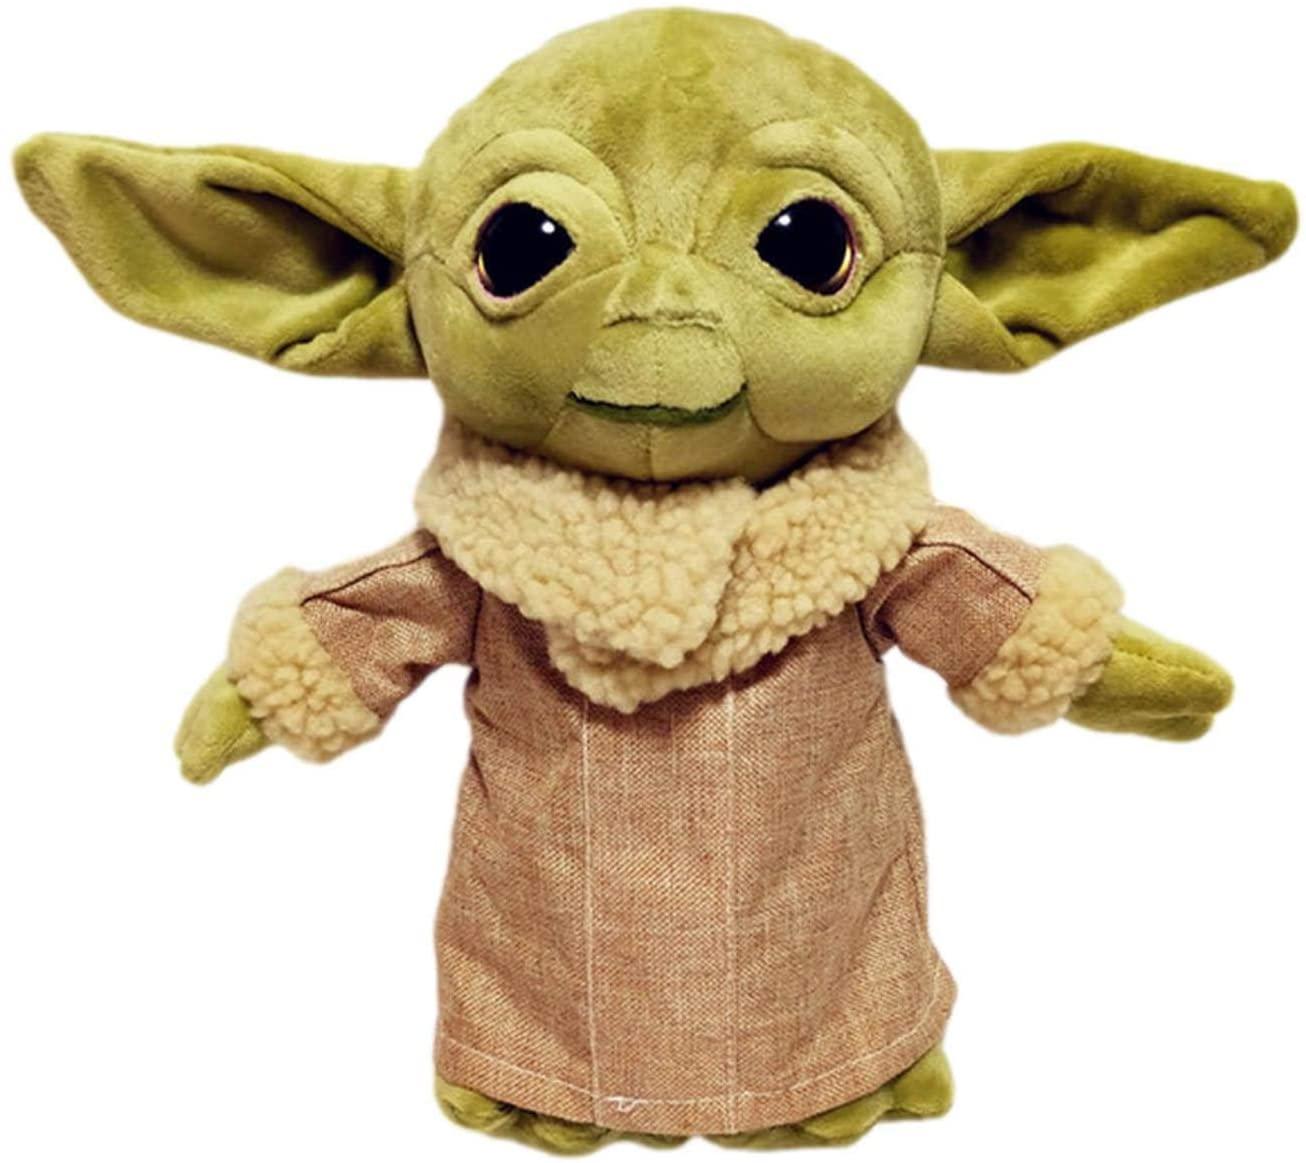 Teckey Baby Yoda Plush Doll Toy, Mandalorian Doll Toy Yoda Doll, Star wars Children's Birthday Gift